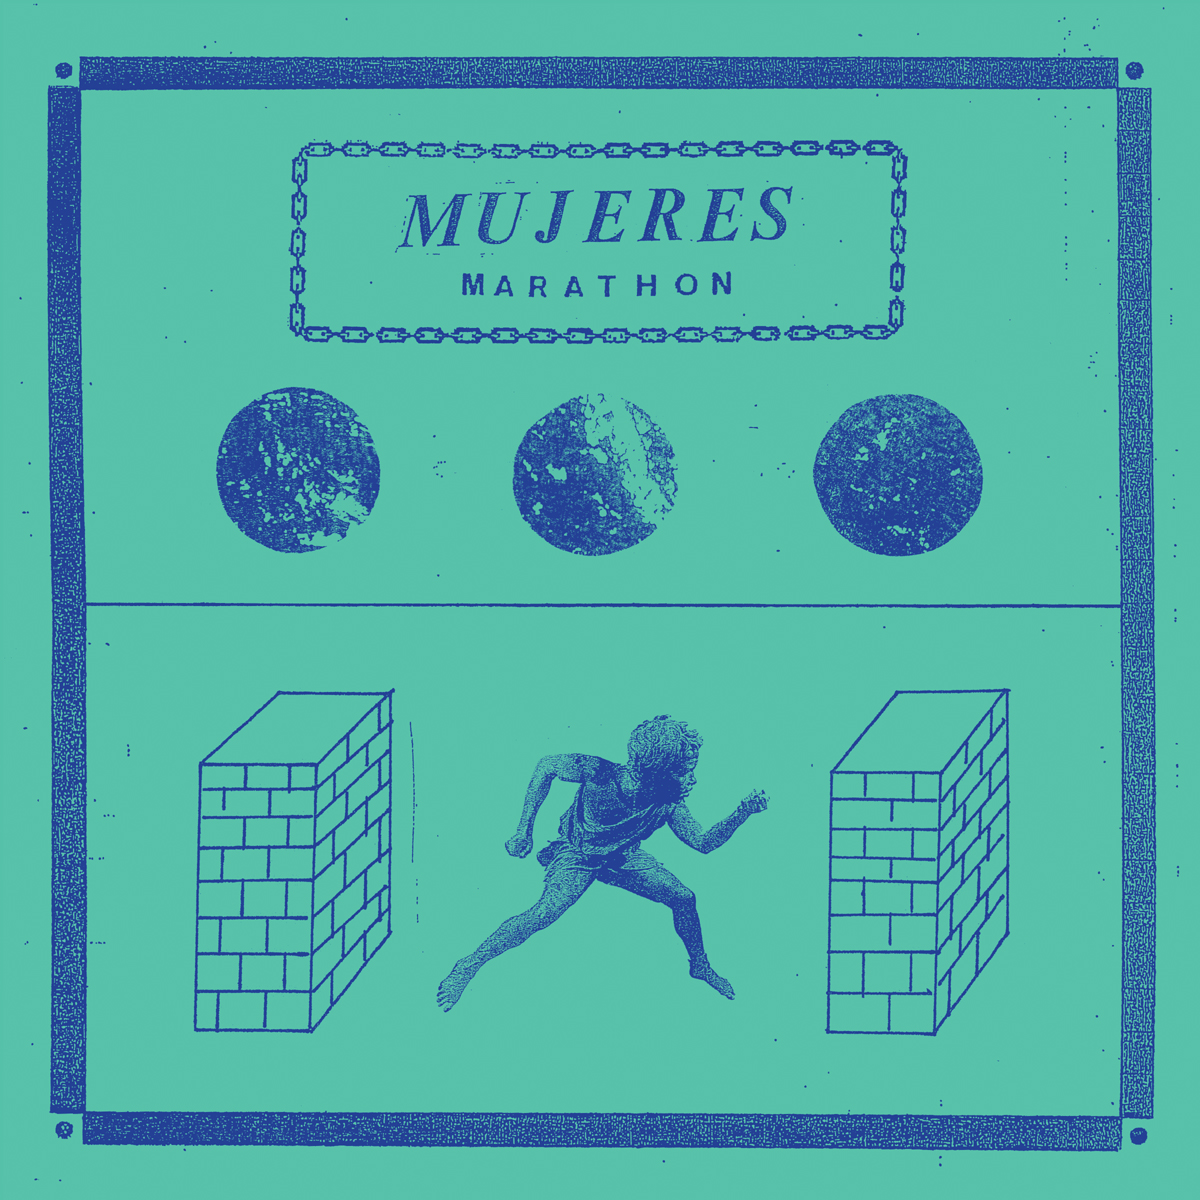 MUJERES - Marathon (Cover)